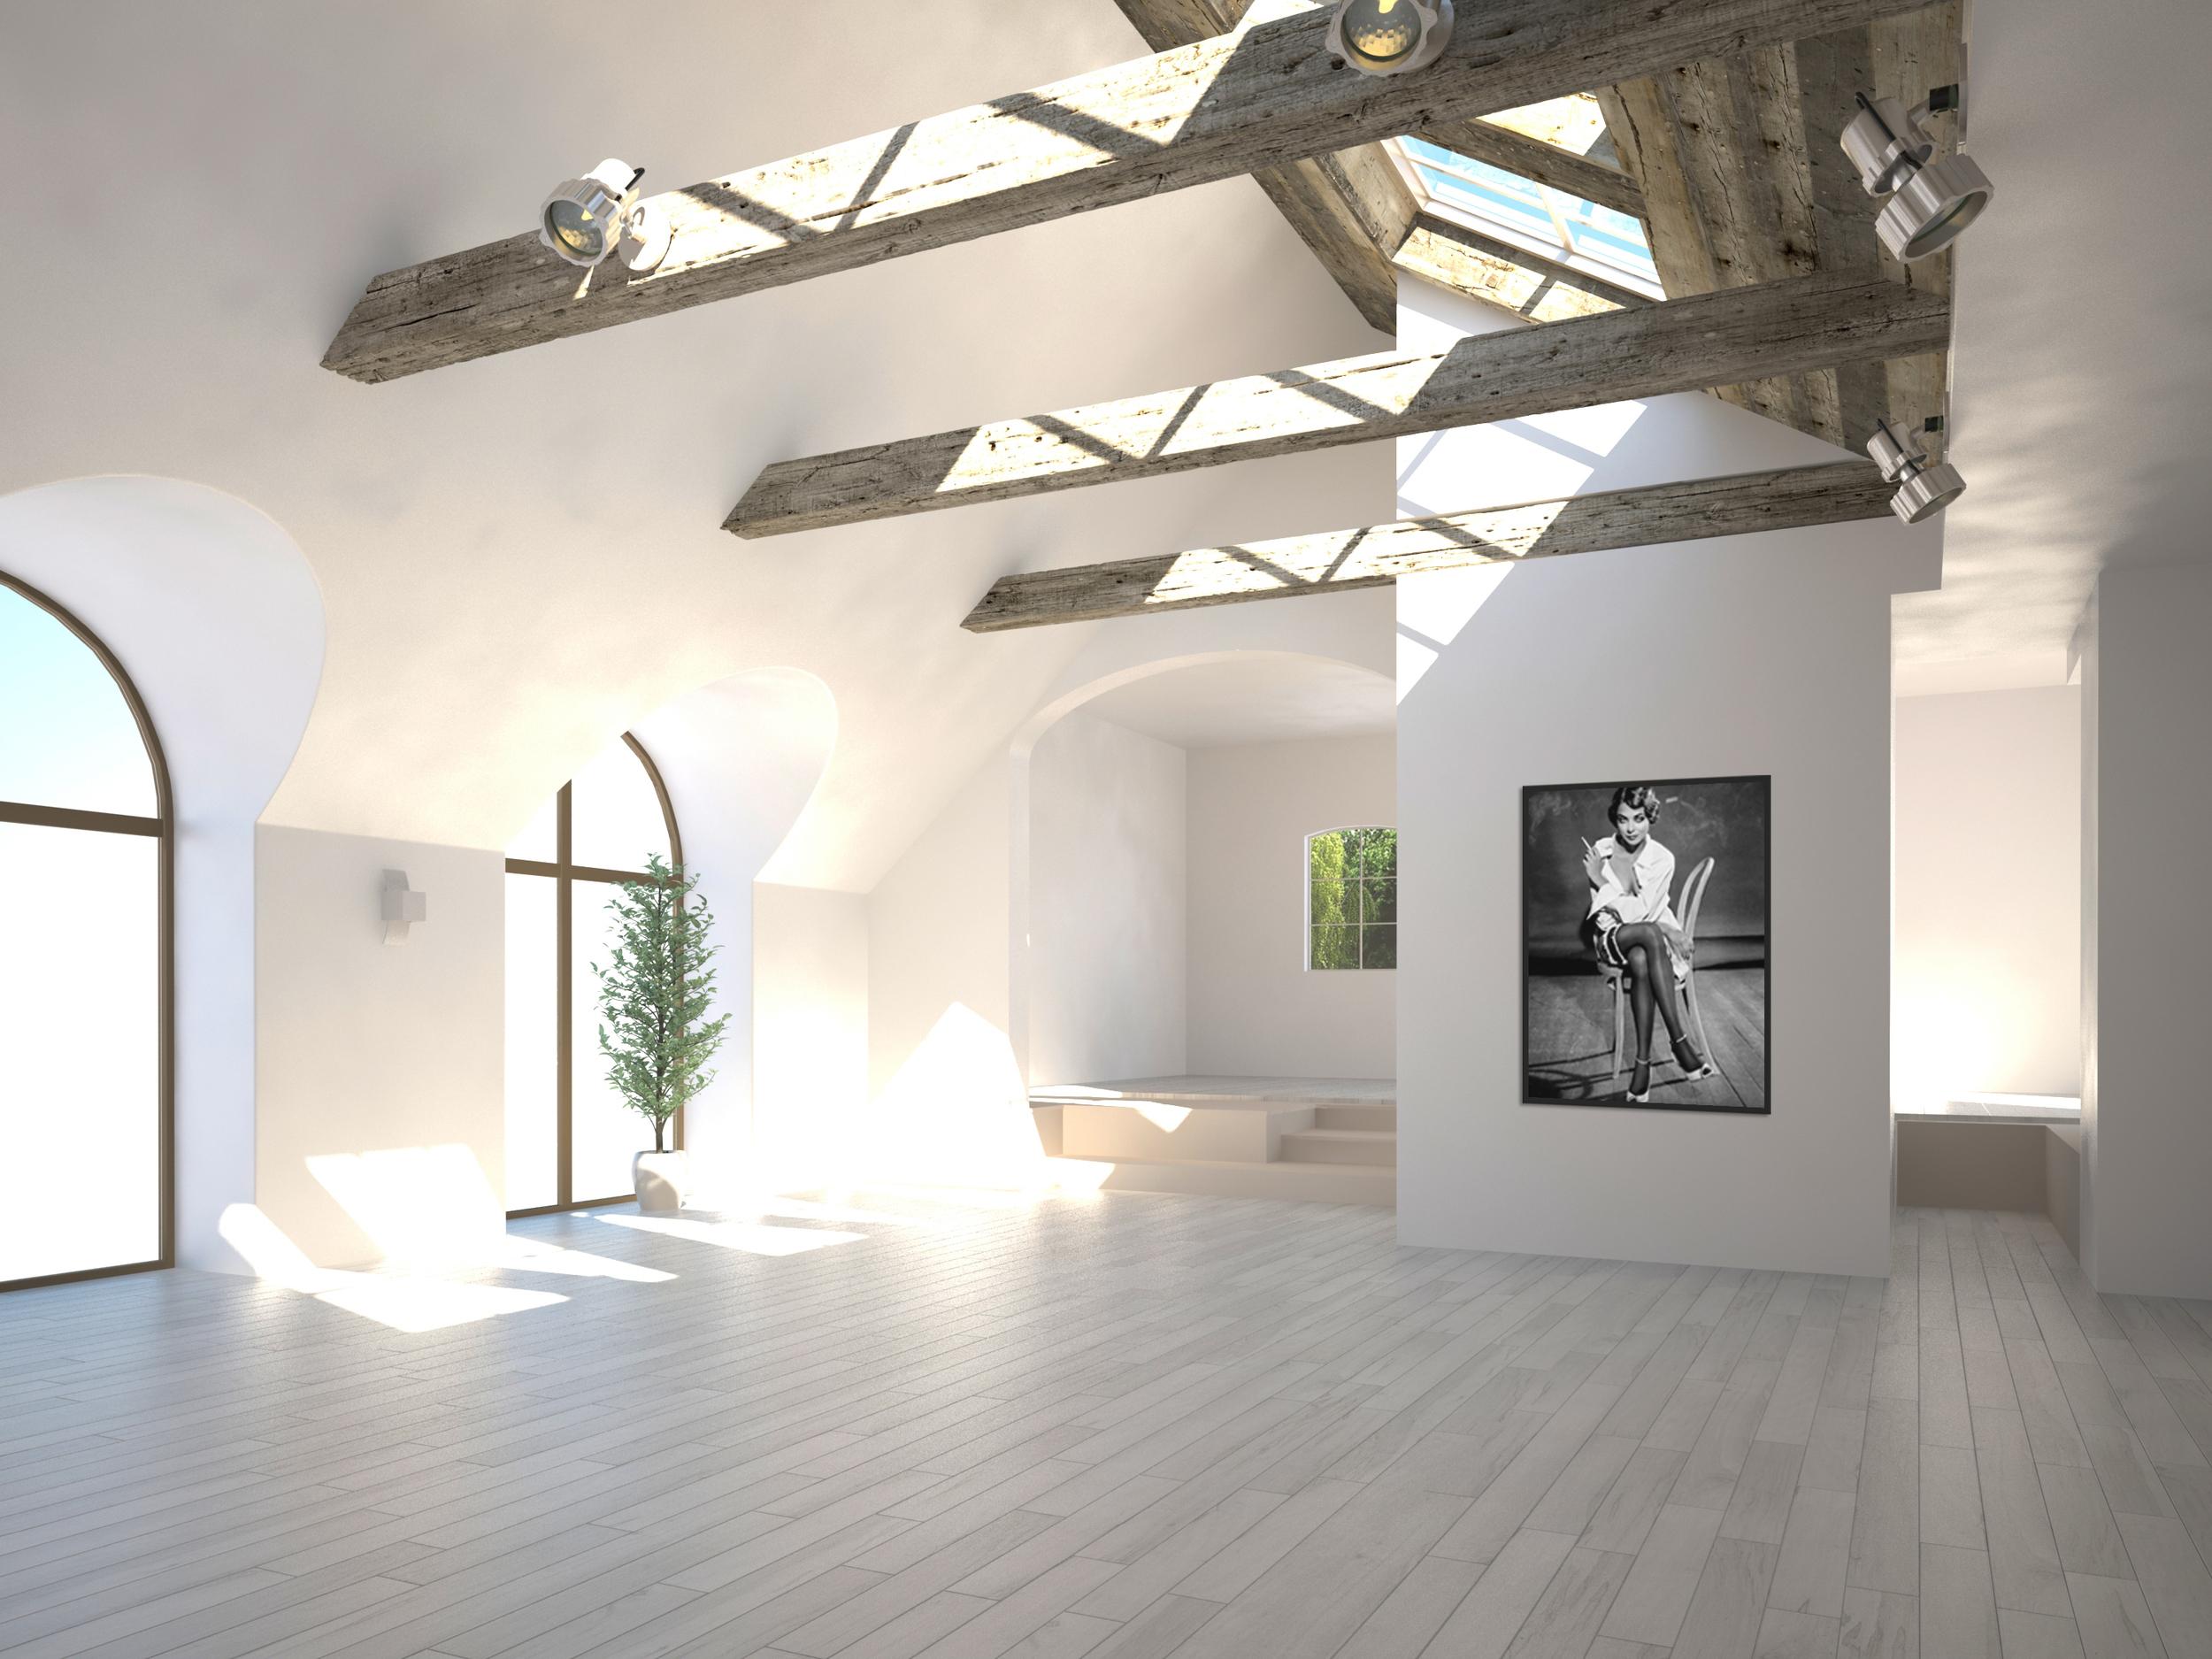 LA GARCONNE_interior (1).jpg